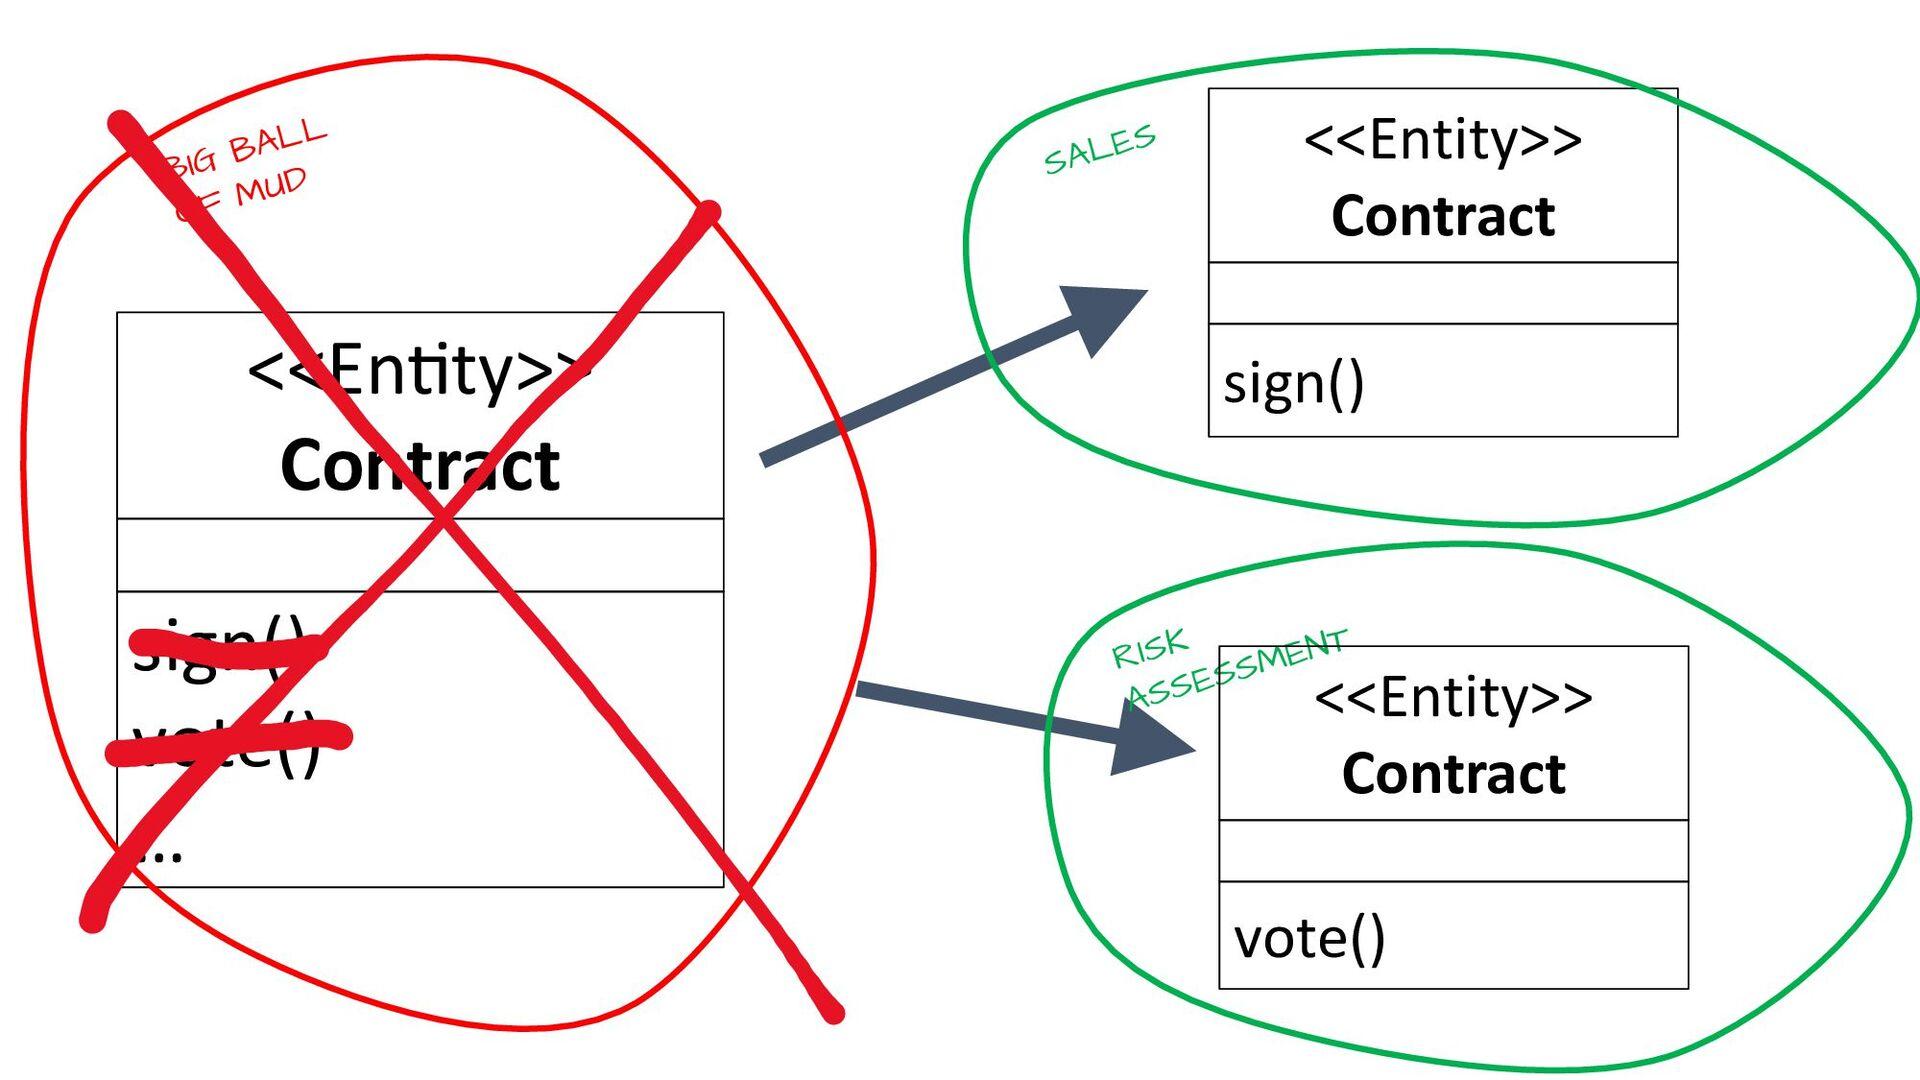 Stefan: sh@wps.de @hofstef speakerdeck.com/hofs...